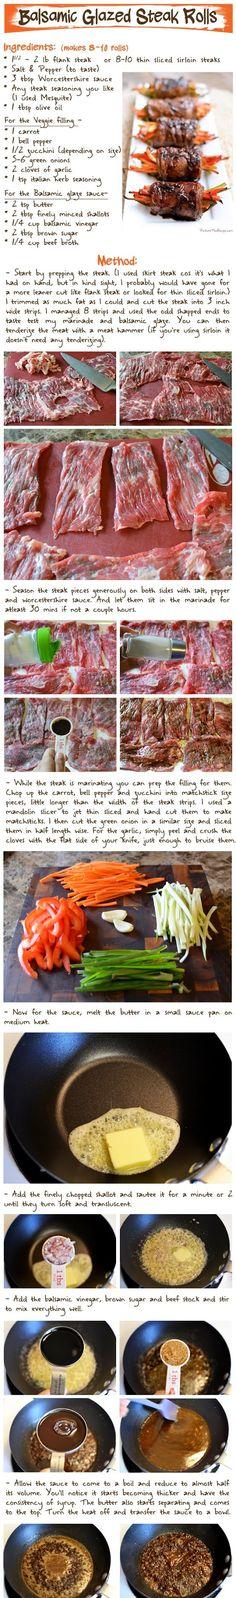 Balsamic Glazed Steak Rolls Recipe (Part-1)